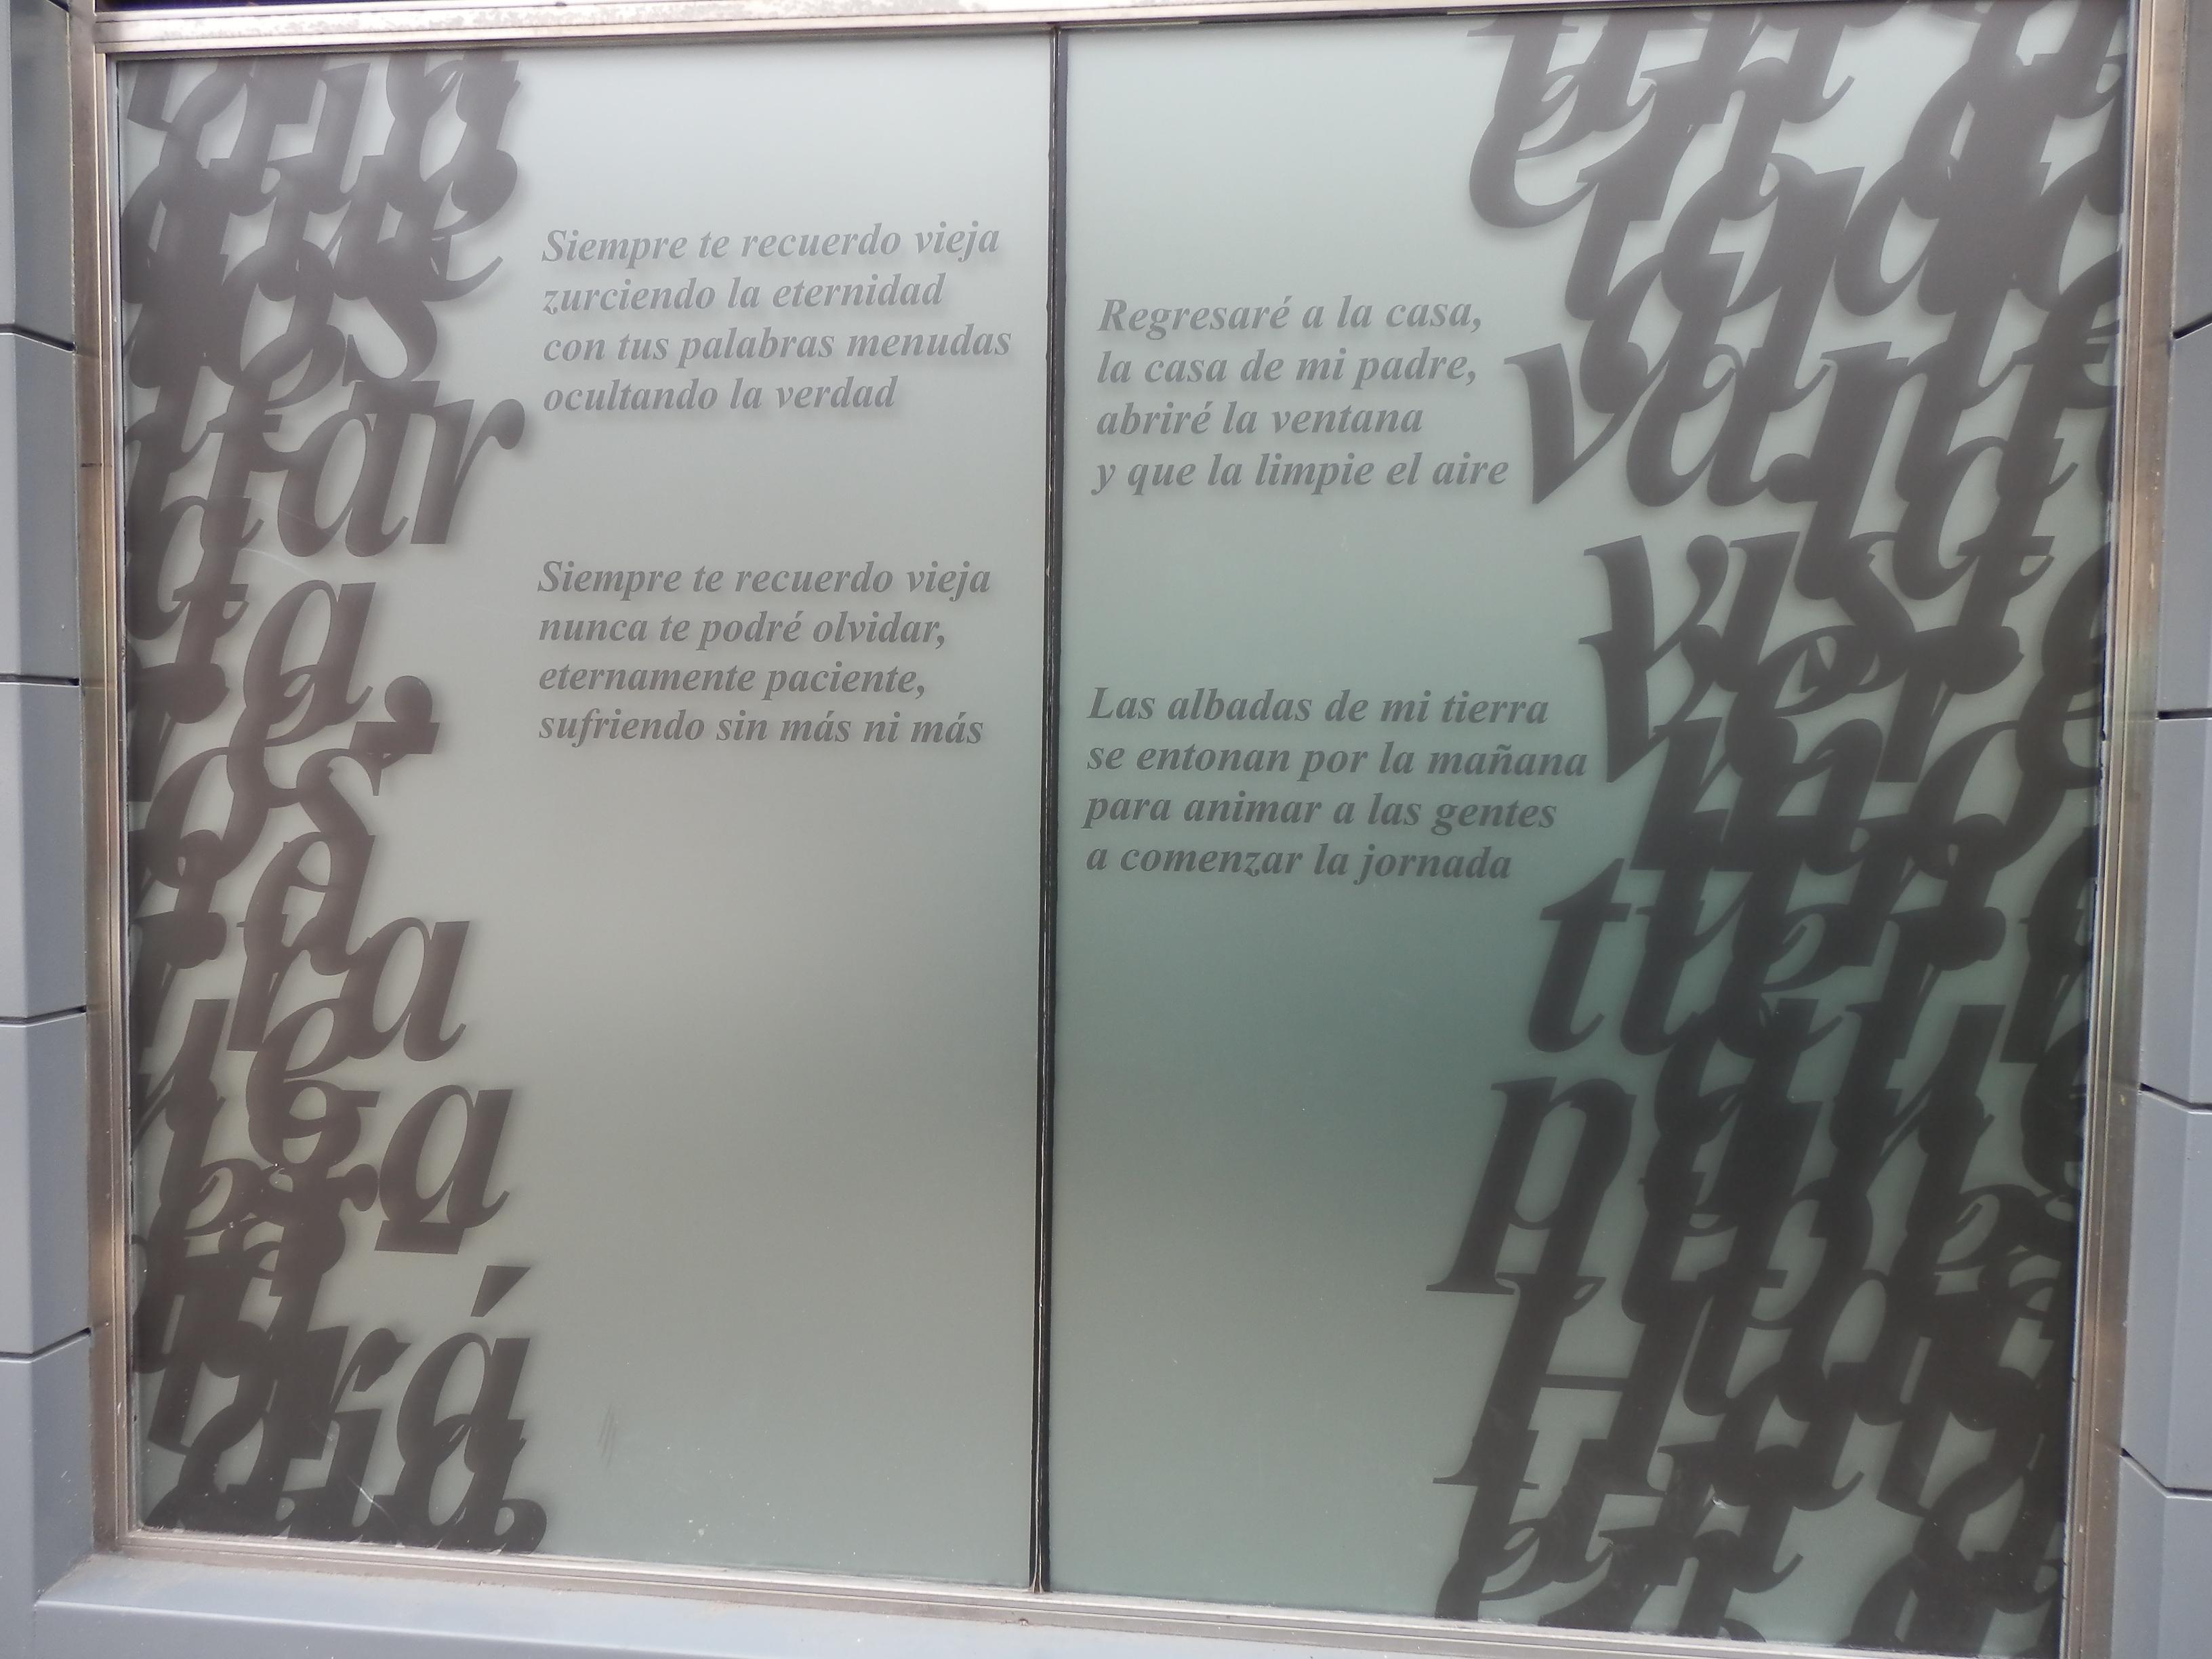 Versos de José Antonio Labordeta.